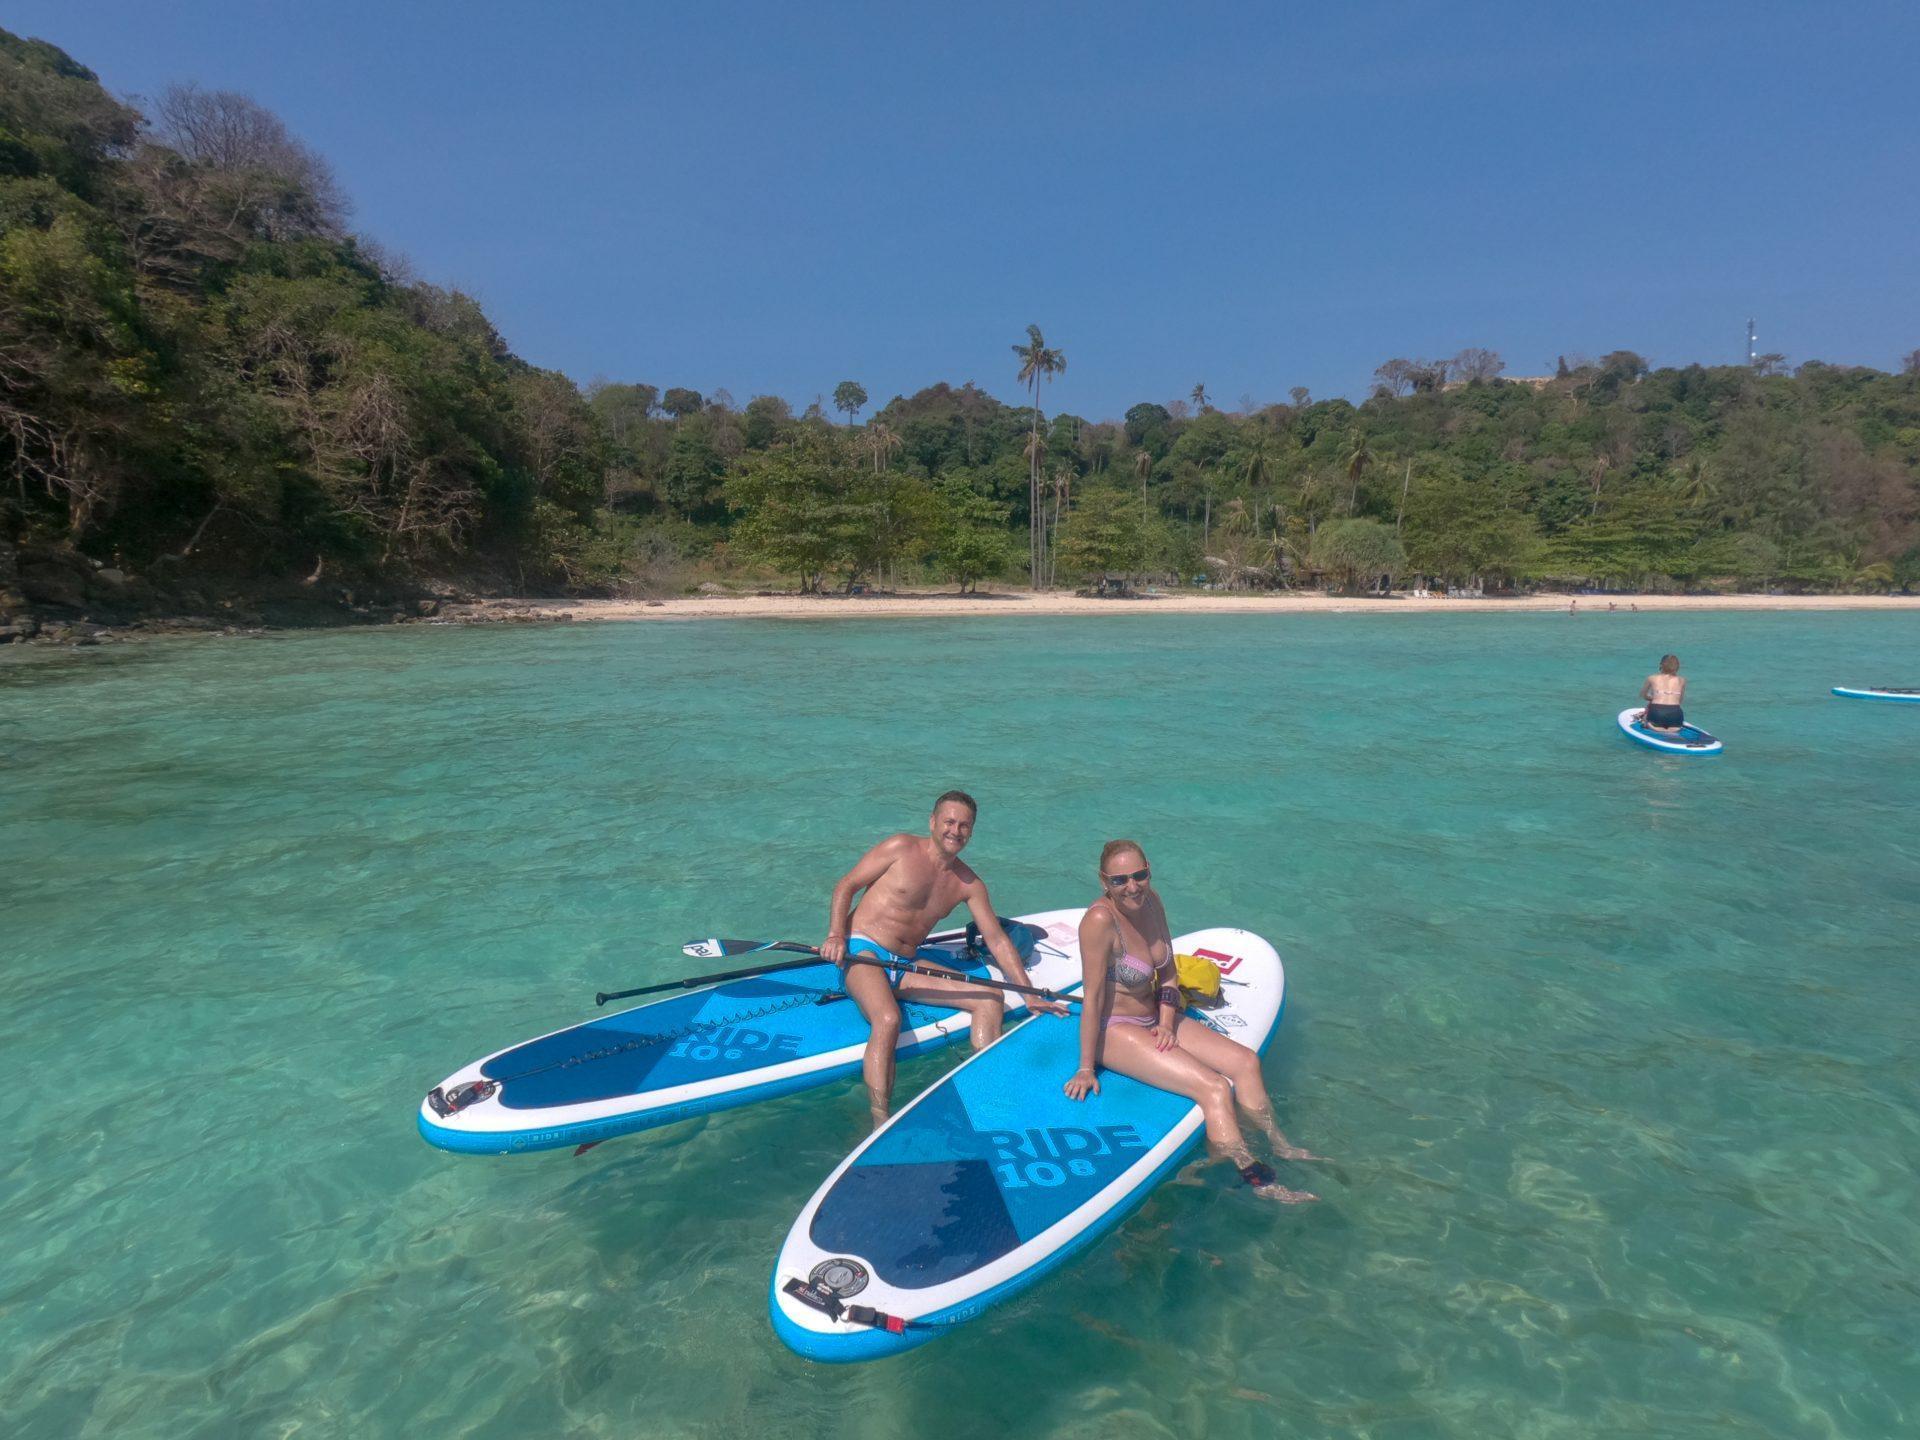 Supanje na turkizni modrini PhiPhi otoka